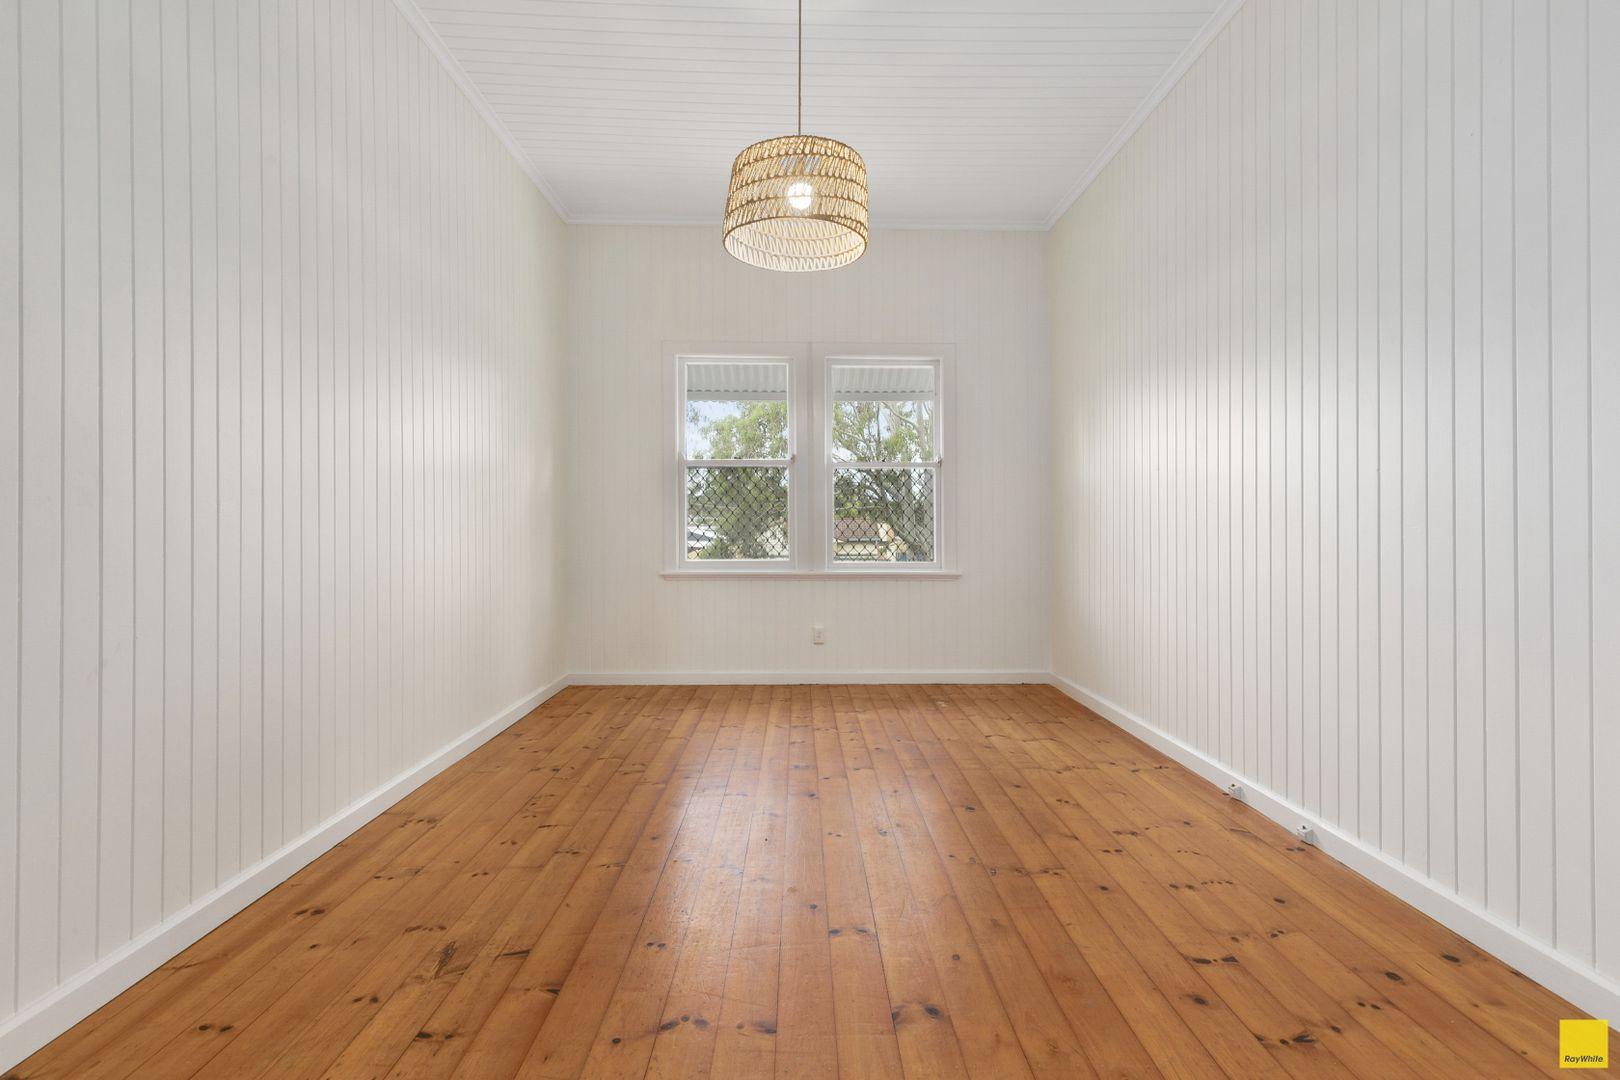 68 Collingwood Road, Birkdale QLD 4159, Image 2